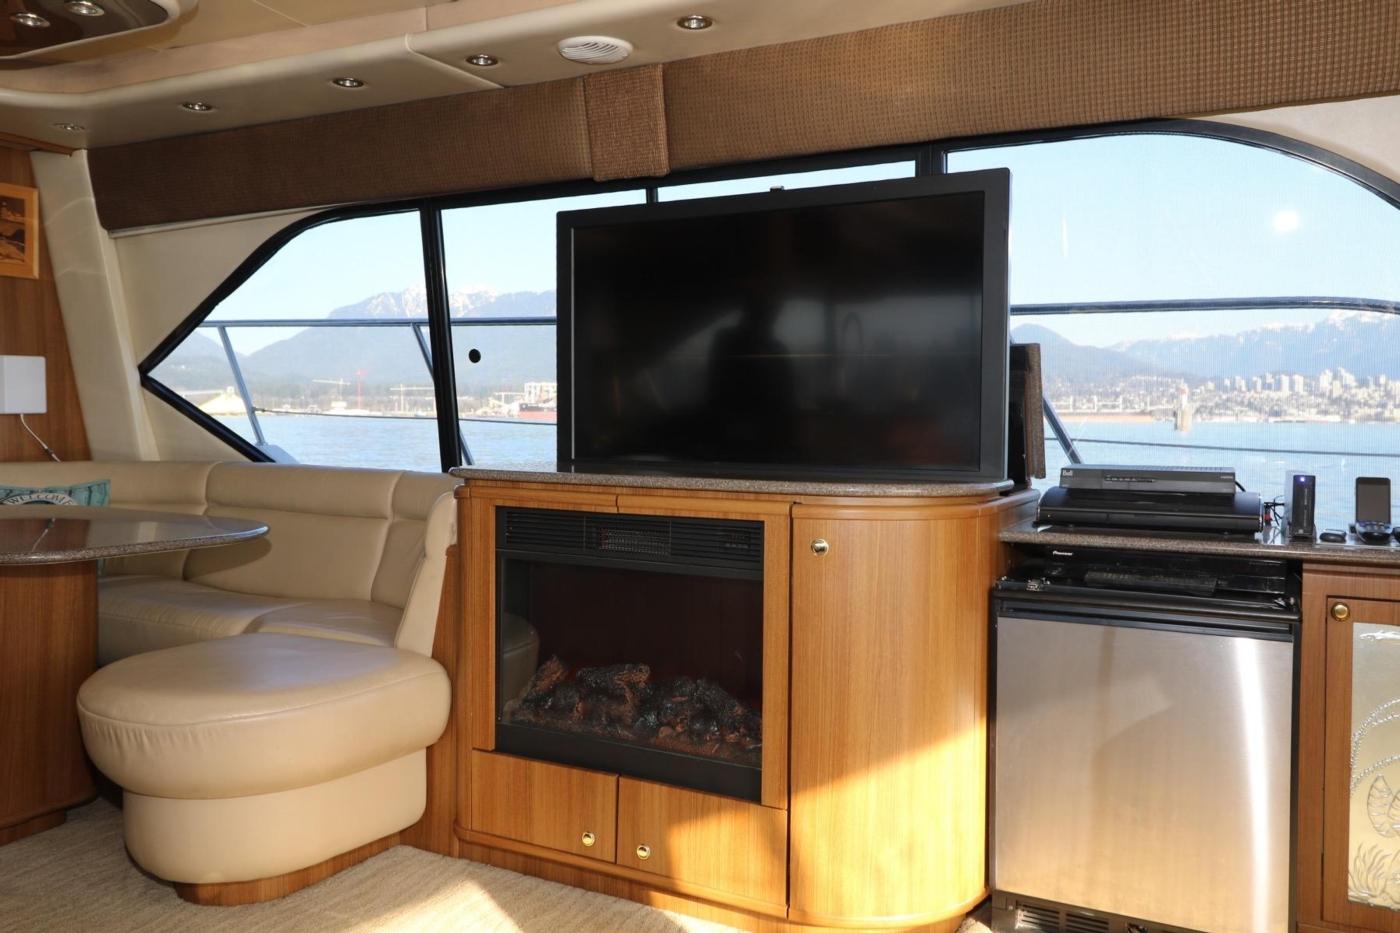 1999 Bayliner 5788 Pilot House Motoryacht, Flat Screen TV